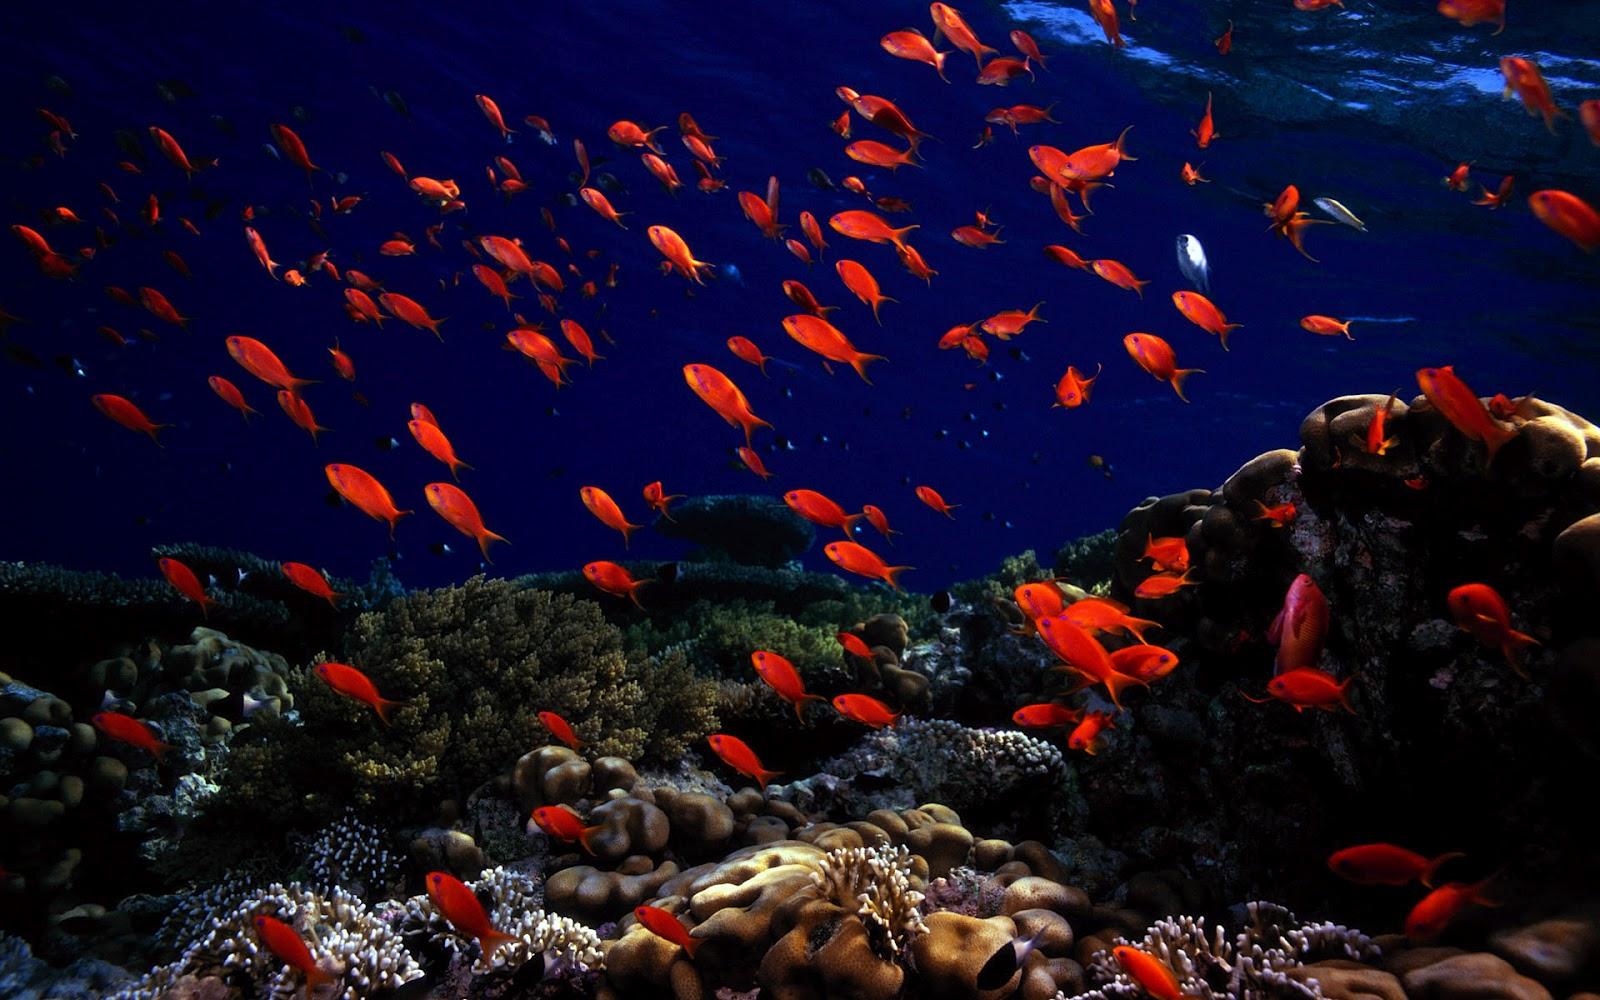 Hd ocean sea life wallpapers